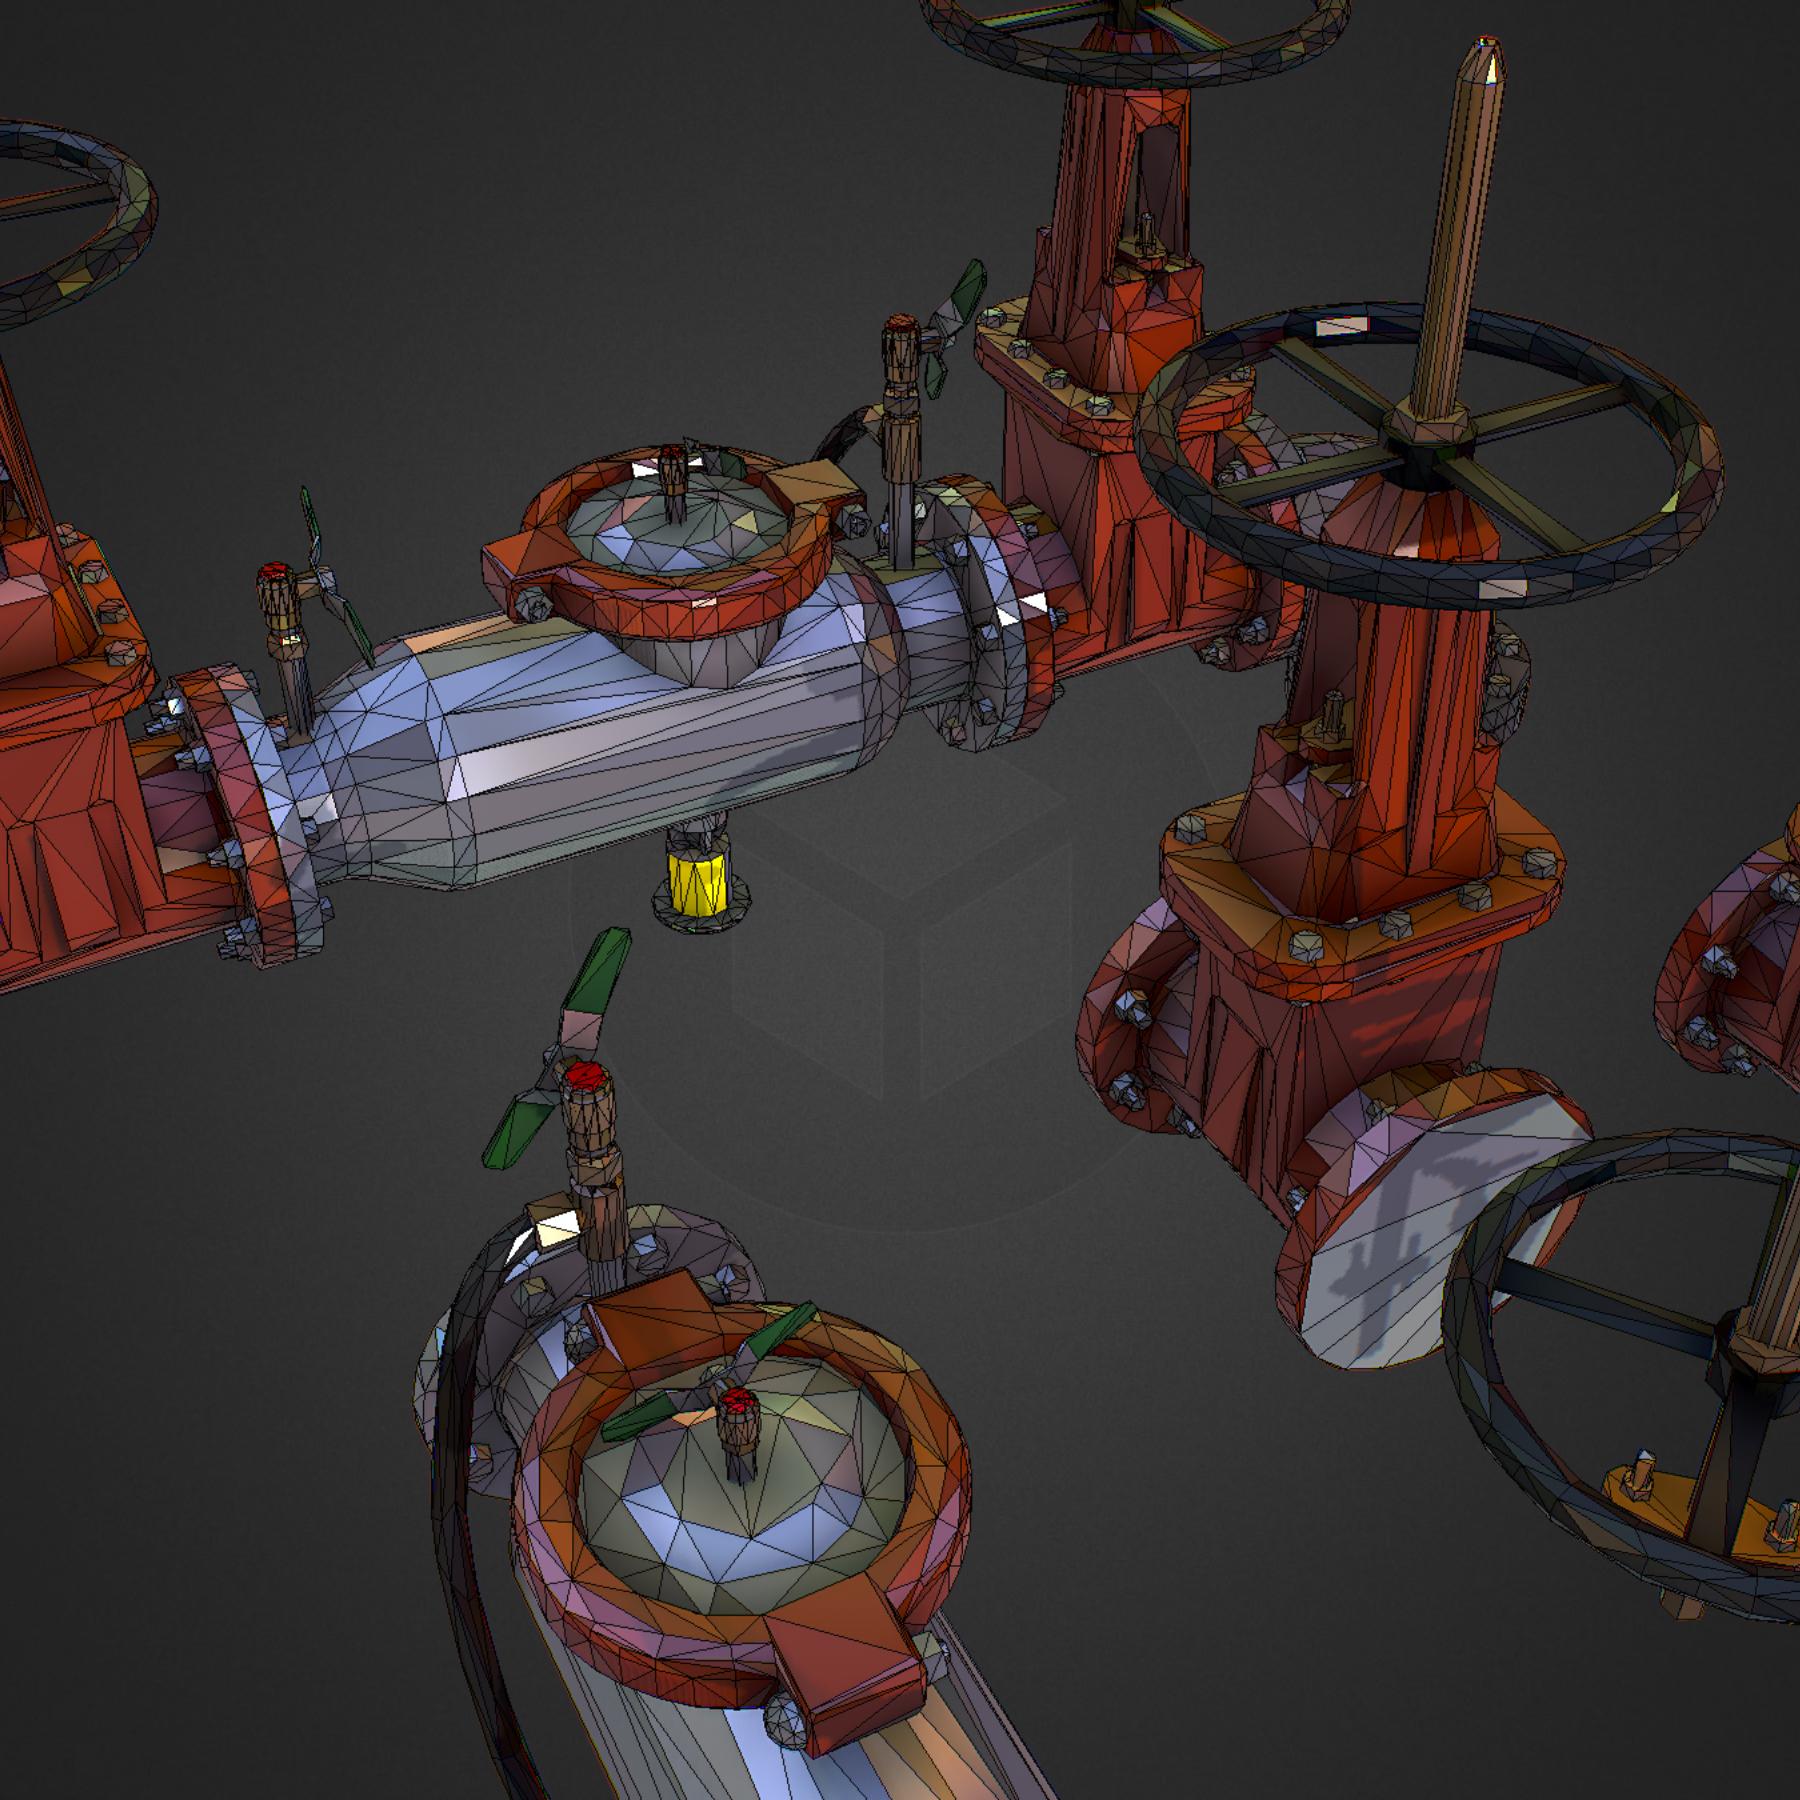 Low Poly ART Backflow Water Pipe Constructor 3d model max 3ds max plugin fbx ma mb tga targa icb vda vst pix obj 272571